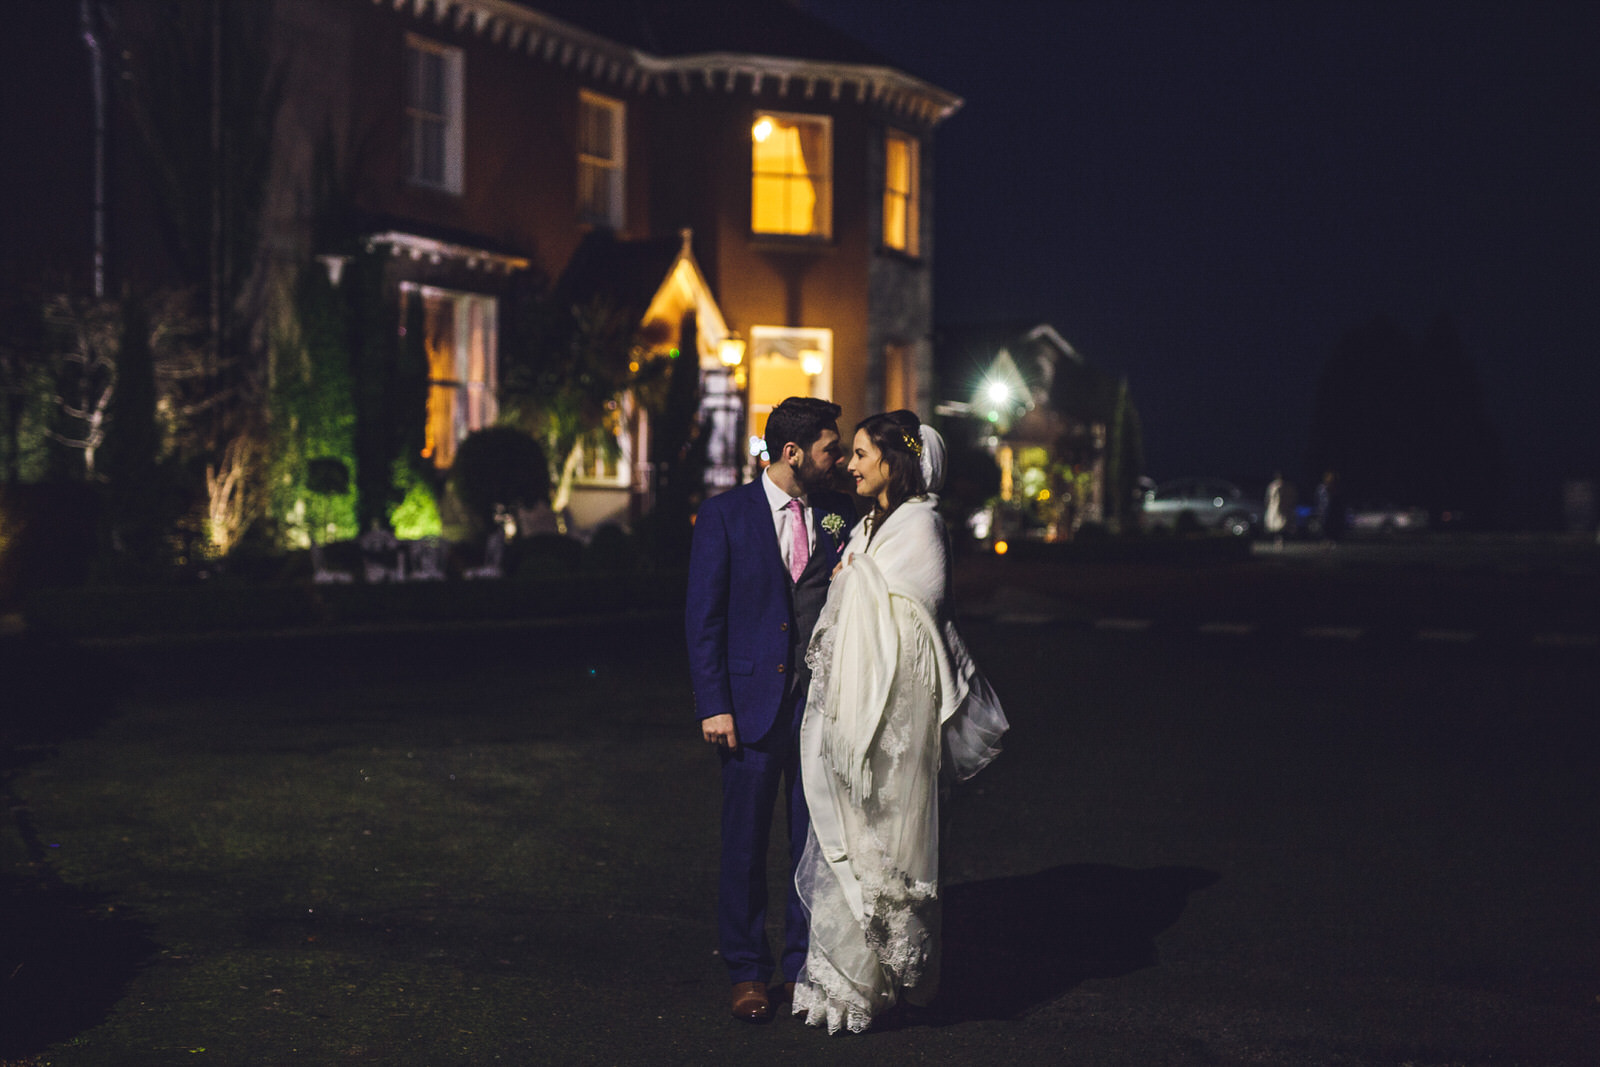 Roger-kenny-wedding-photographer-greystones-wicklow-dublin_091.jpg